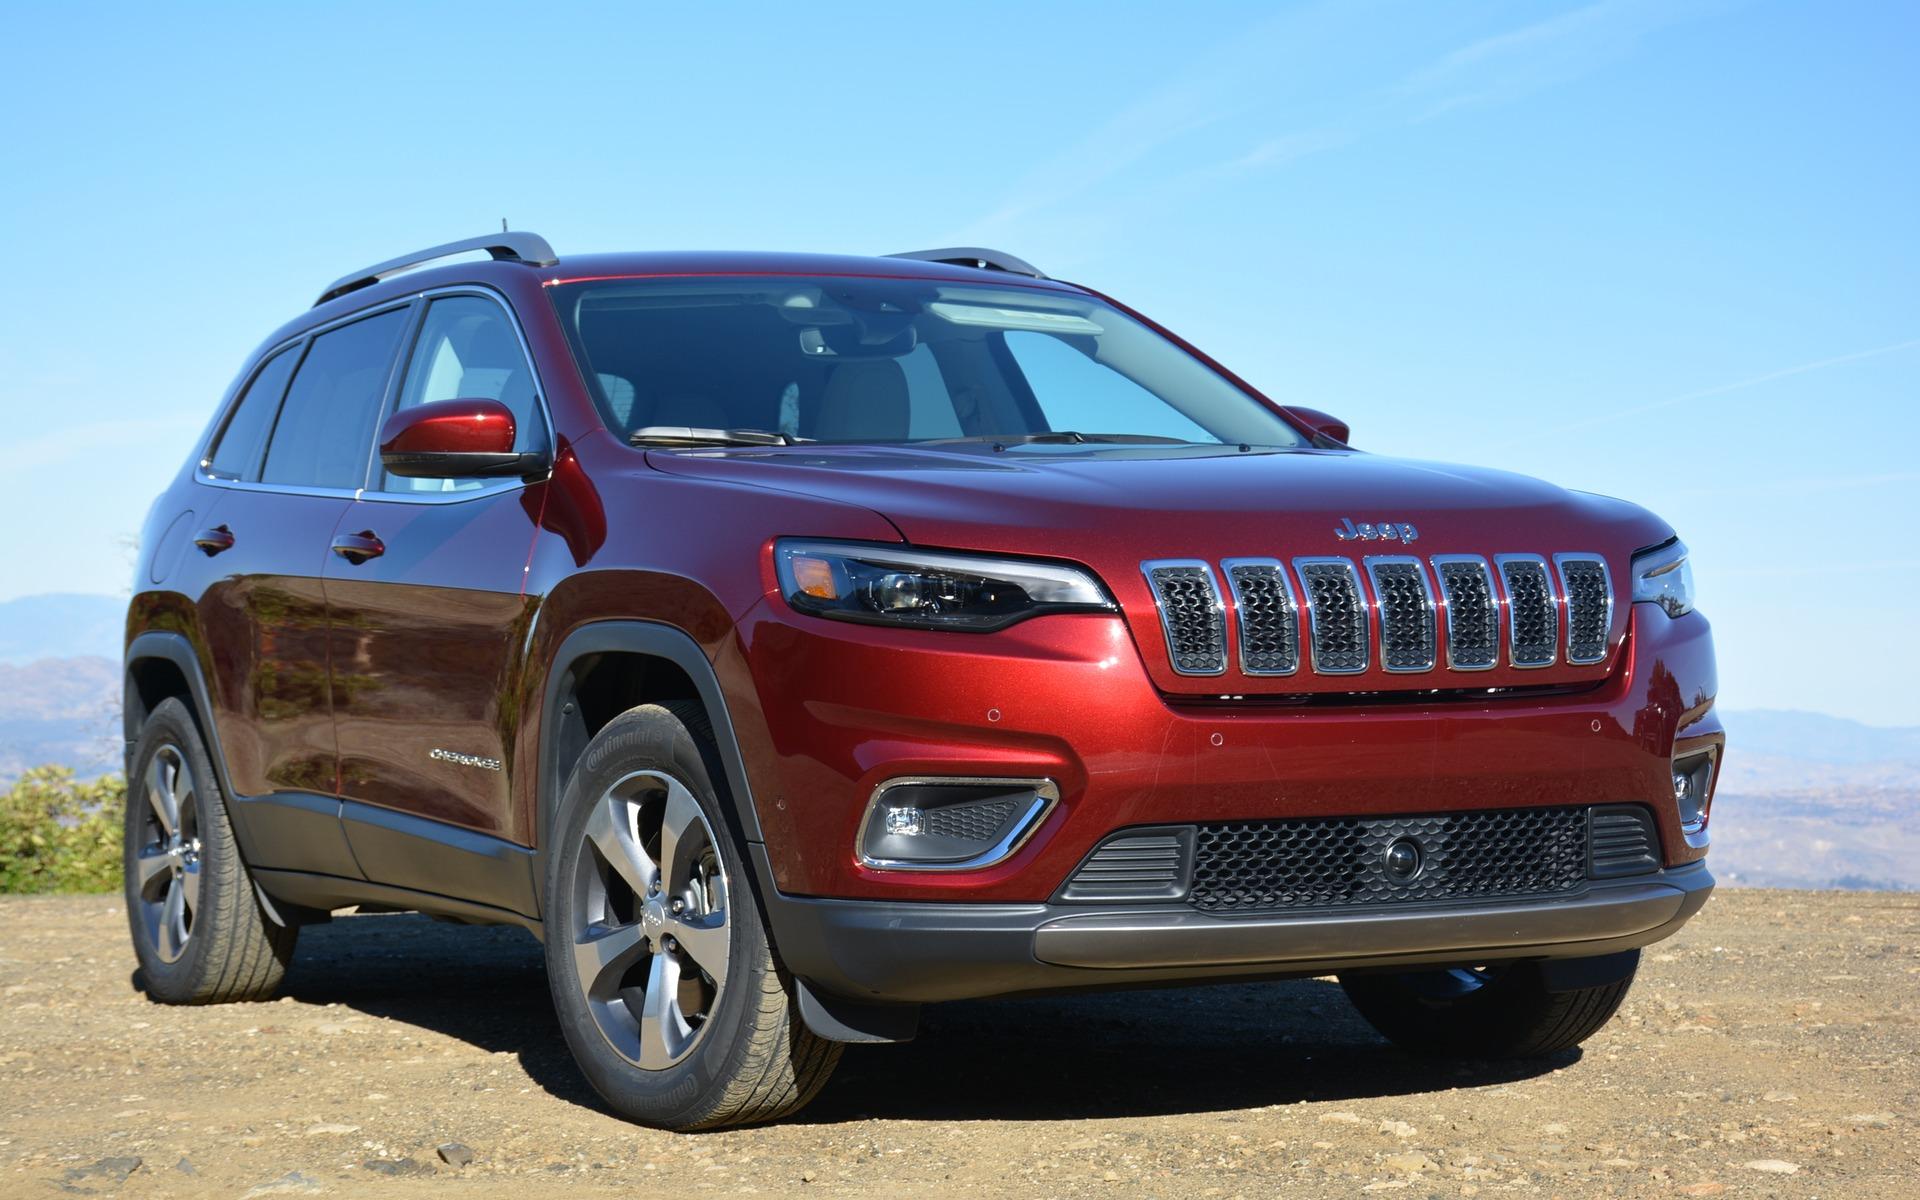 The new 2019 Jeep Cherokee